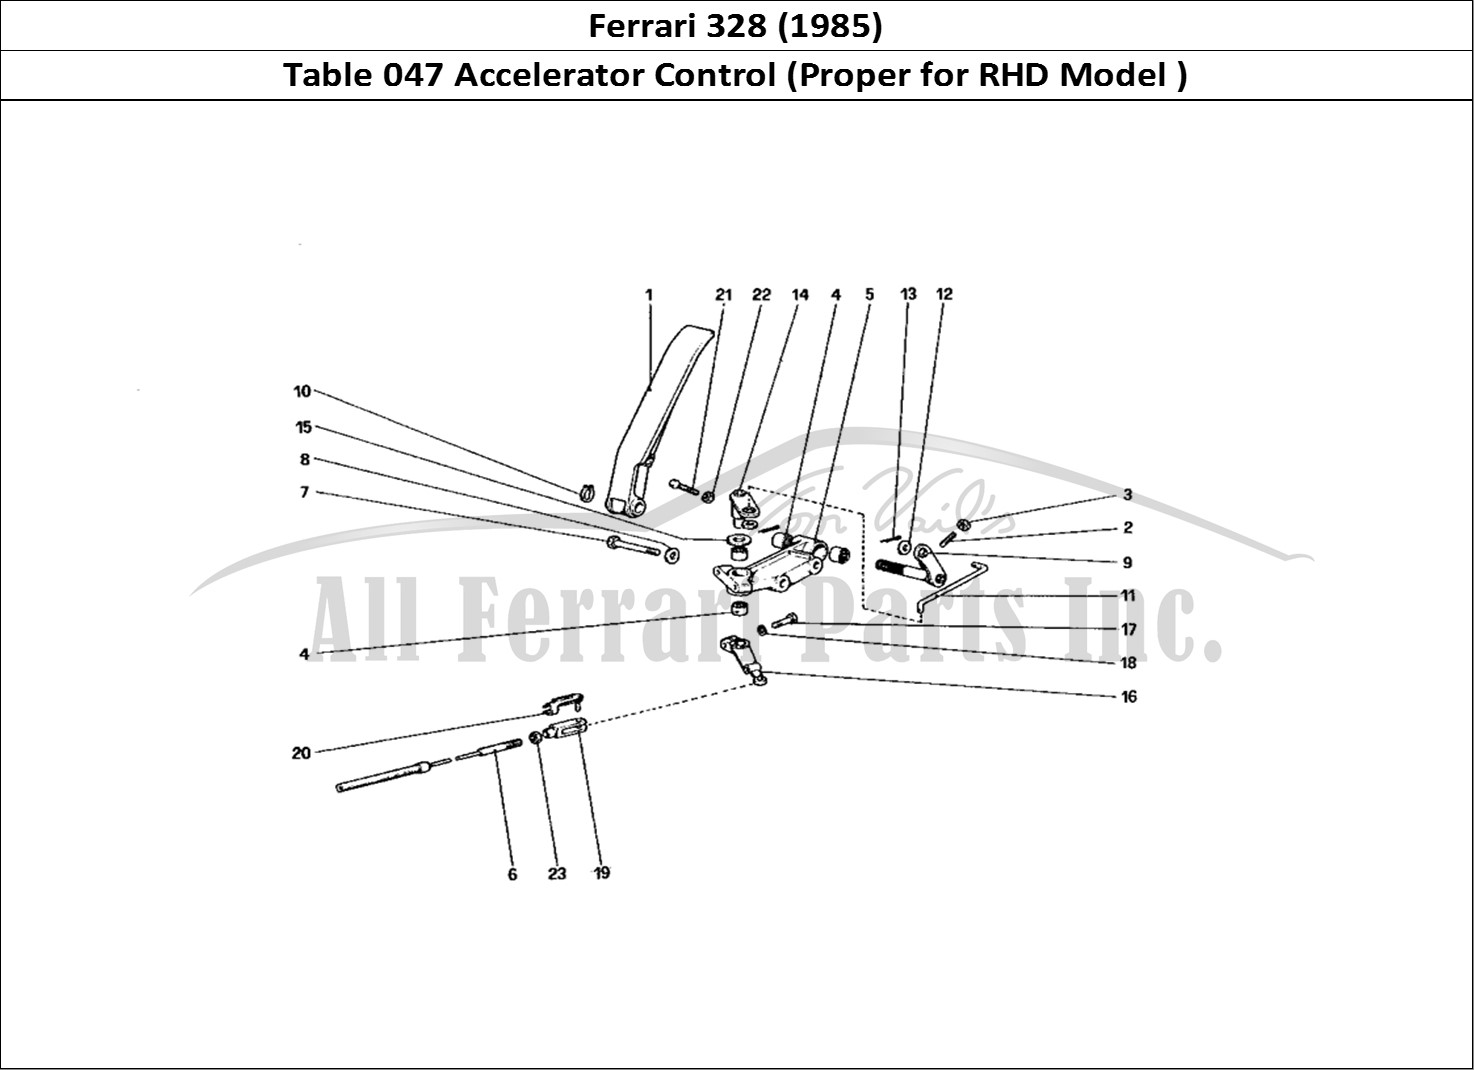 Buy Original Ferrari 328 047 Accelerator Control